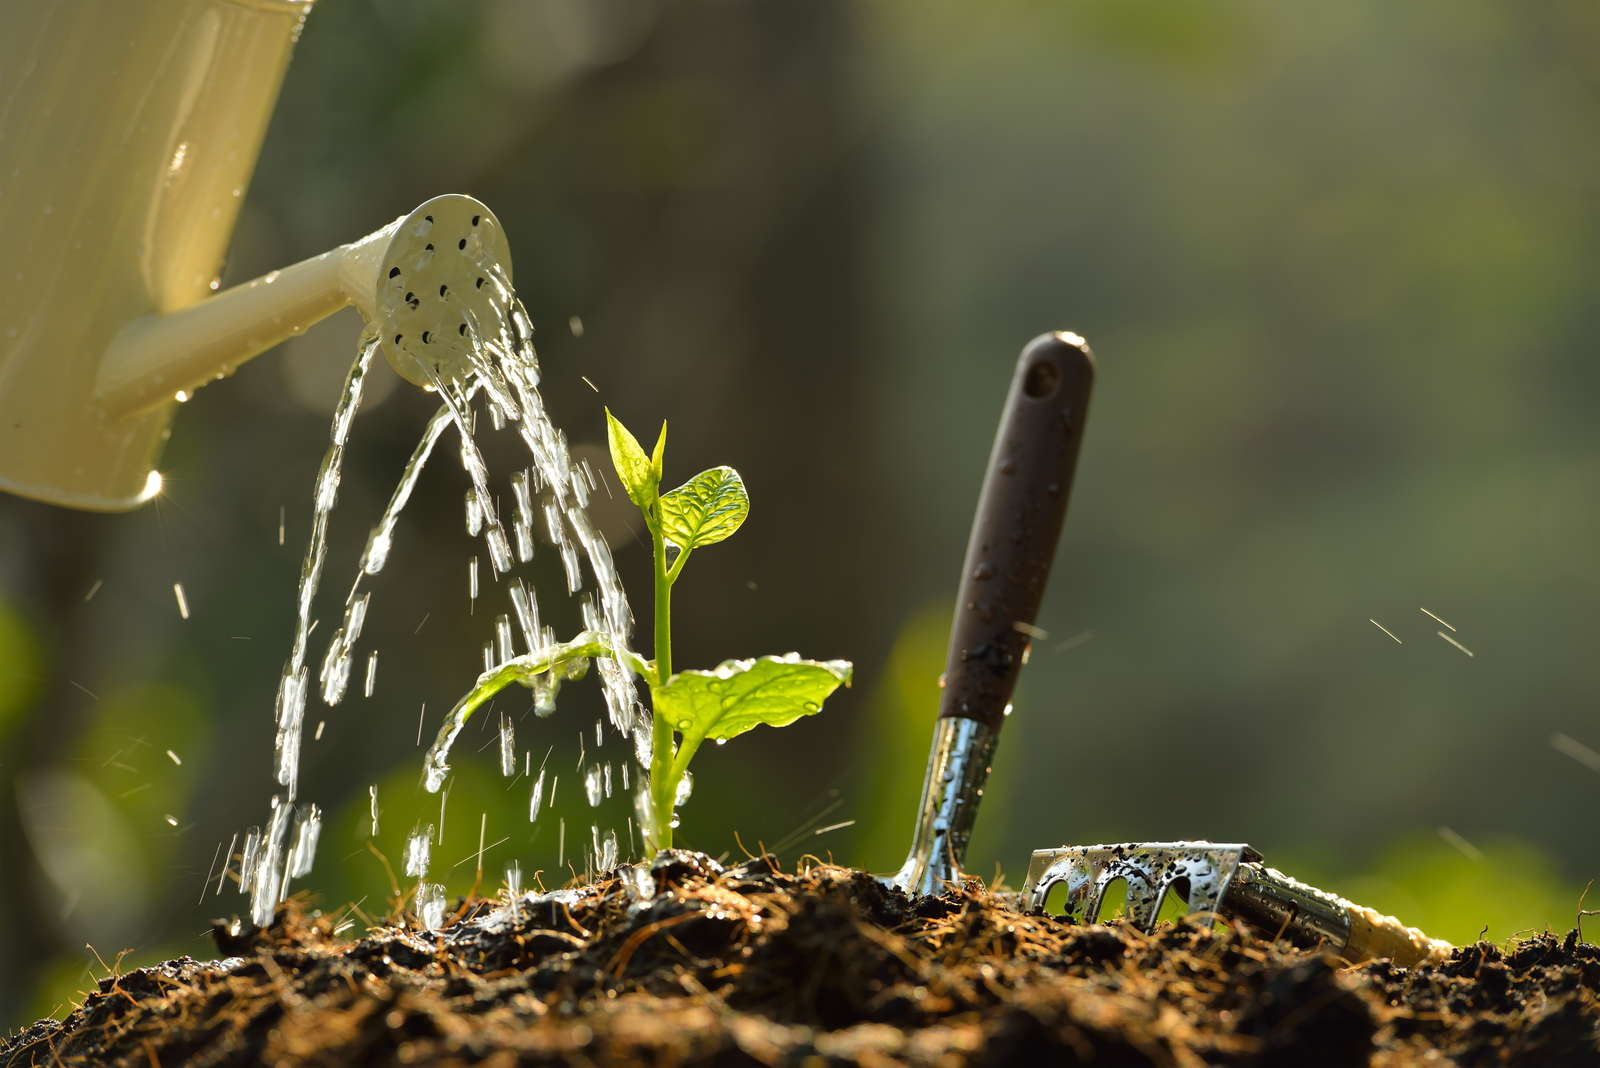 Stecklinge Vegetative Vermehrung Optimale Bedingungen Plantura